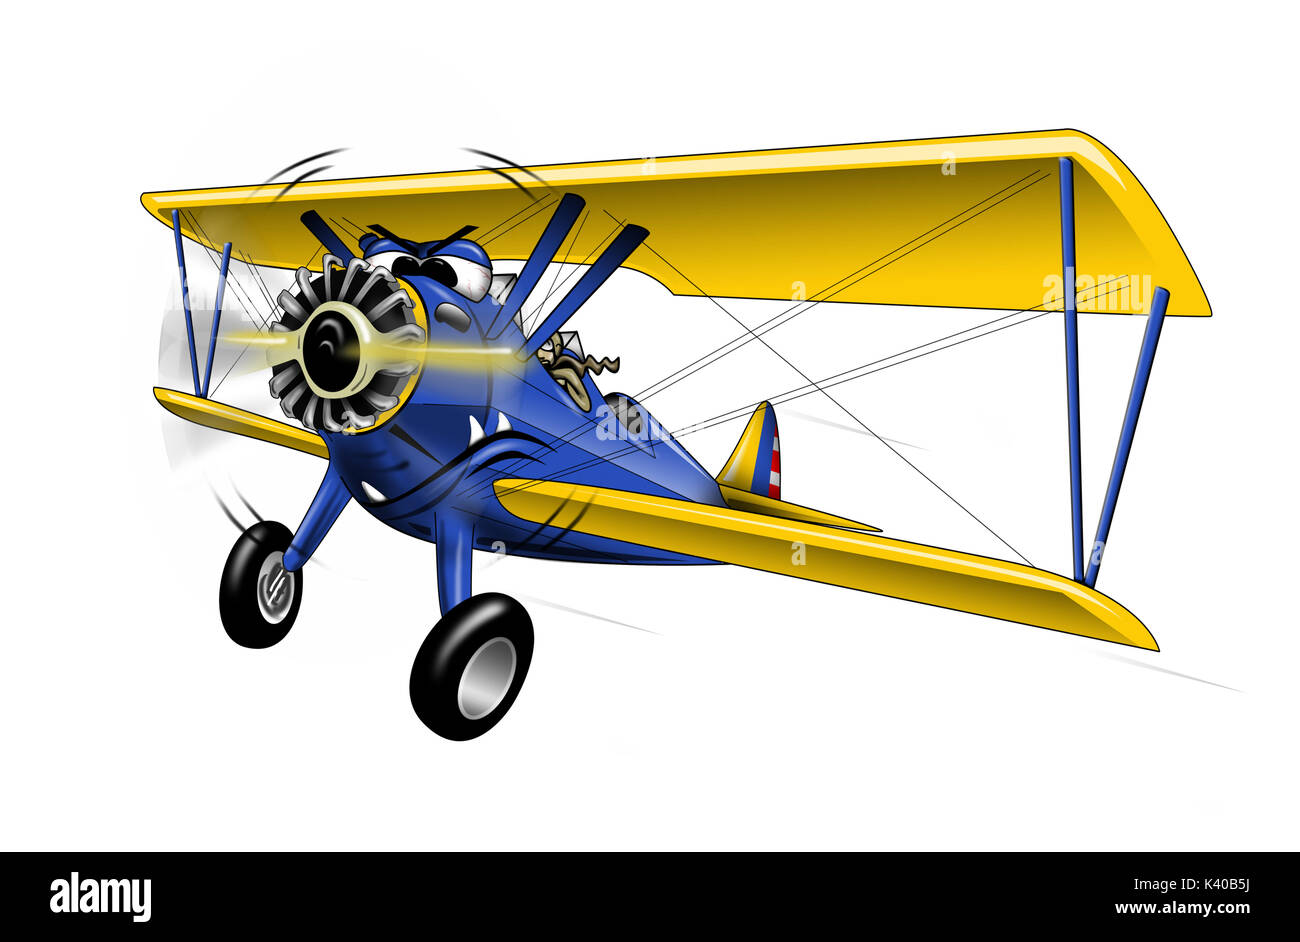 WWI Bi-plane Warbird Cartoon Illustration - Stock Image